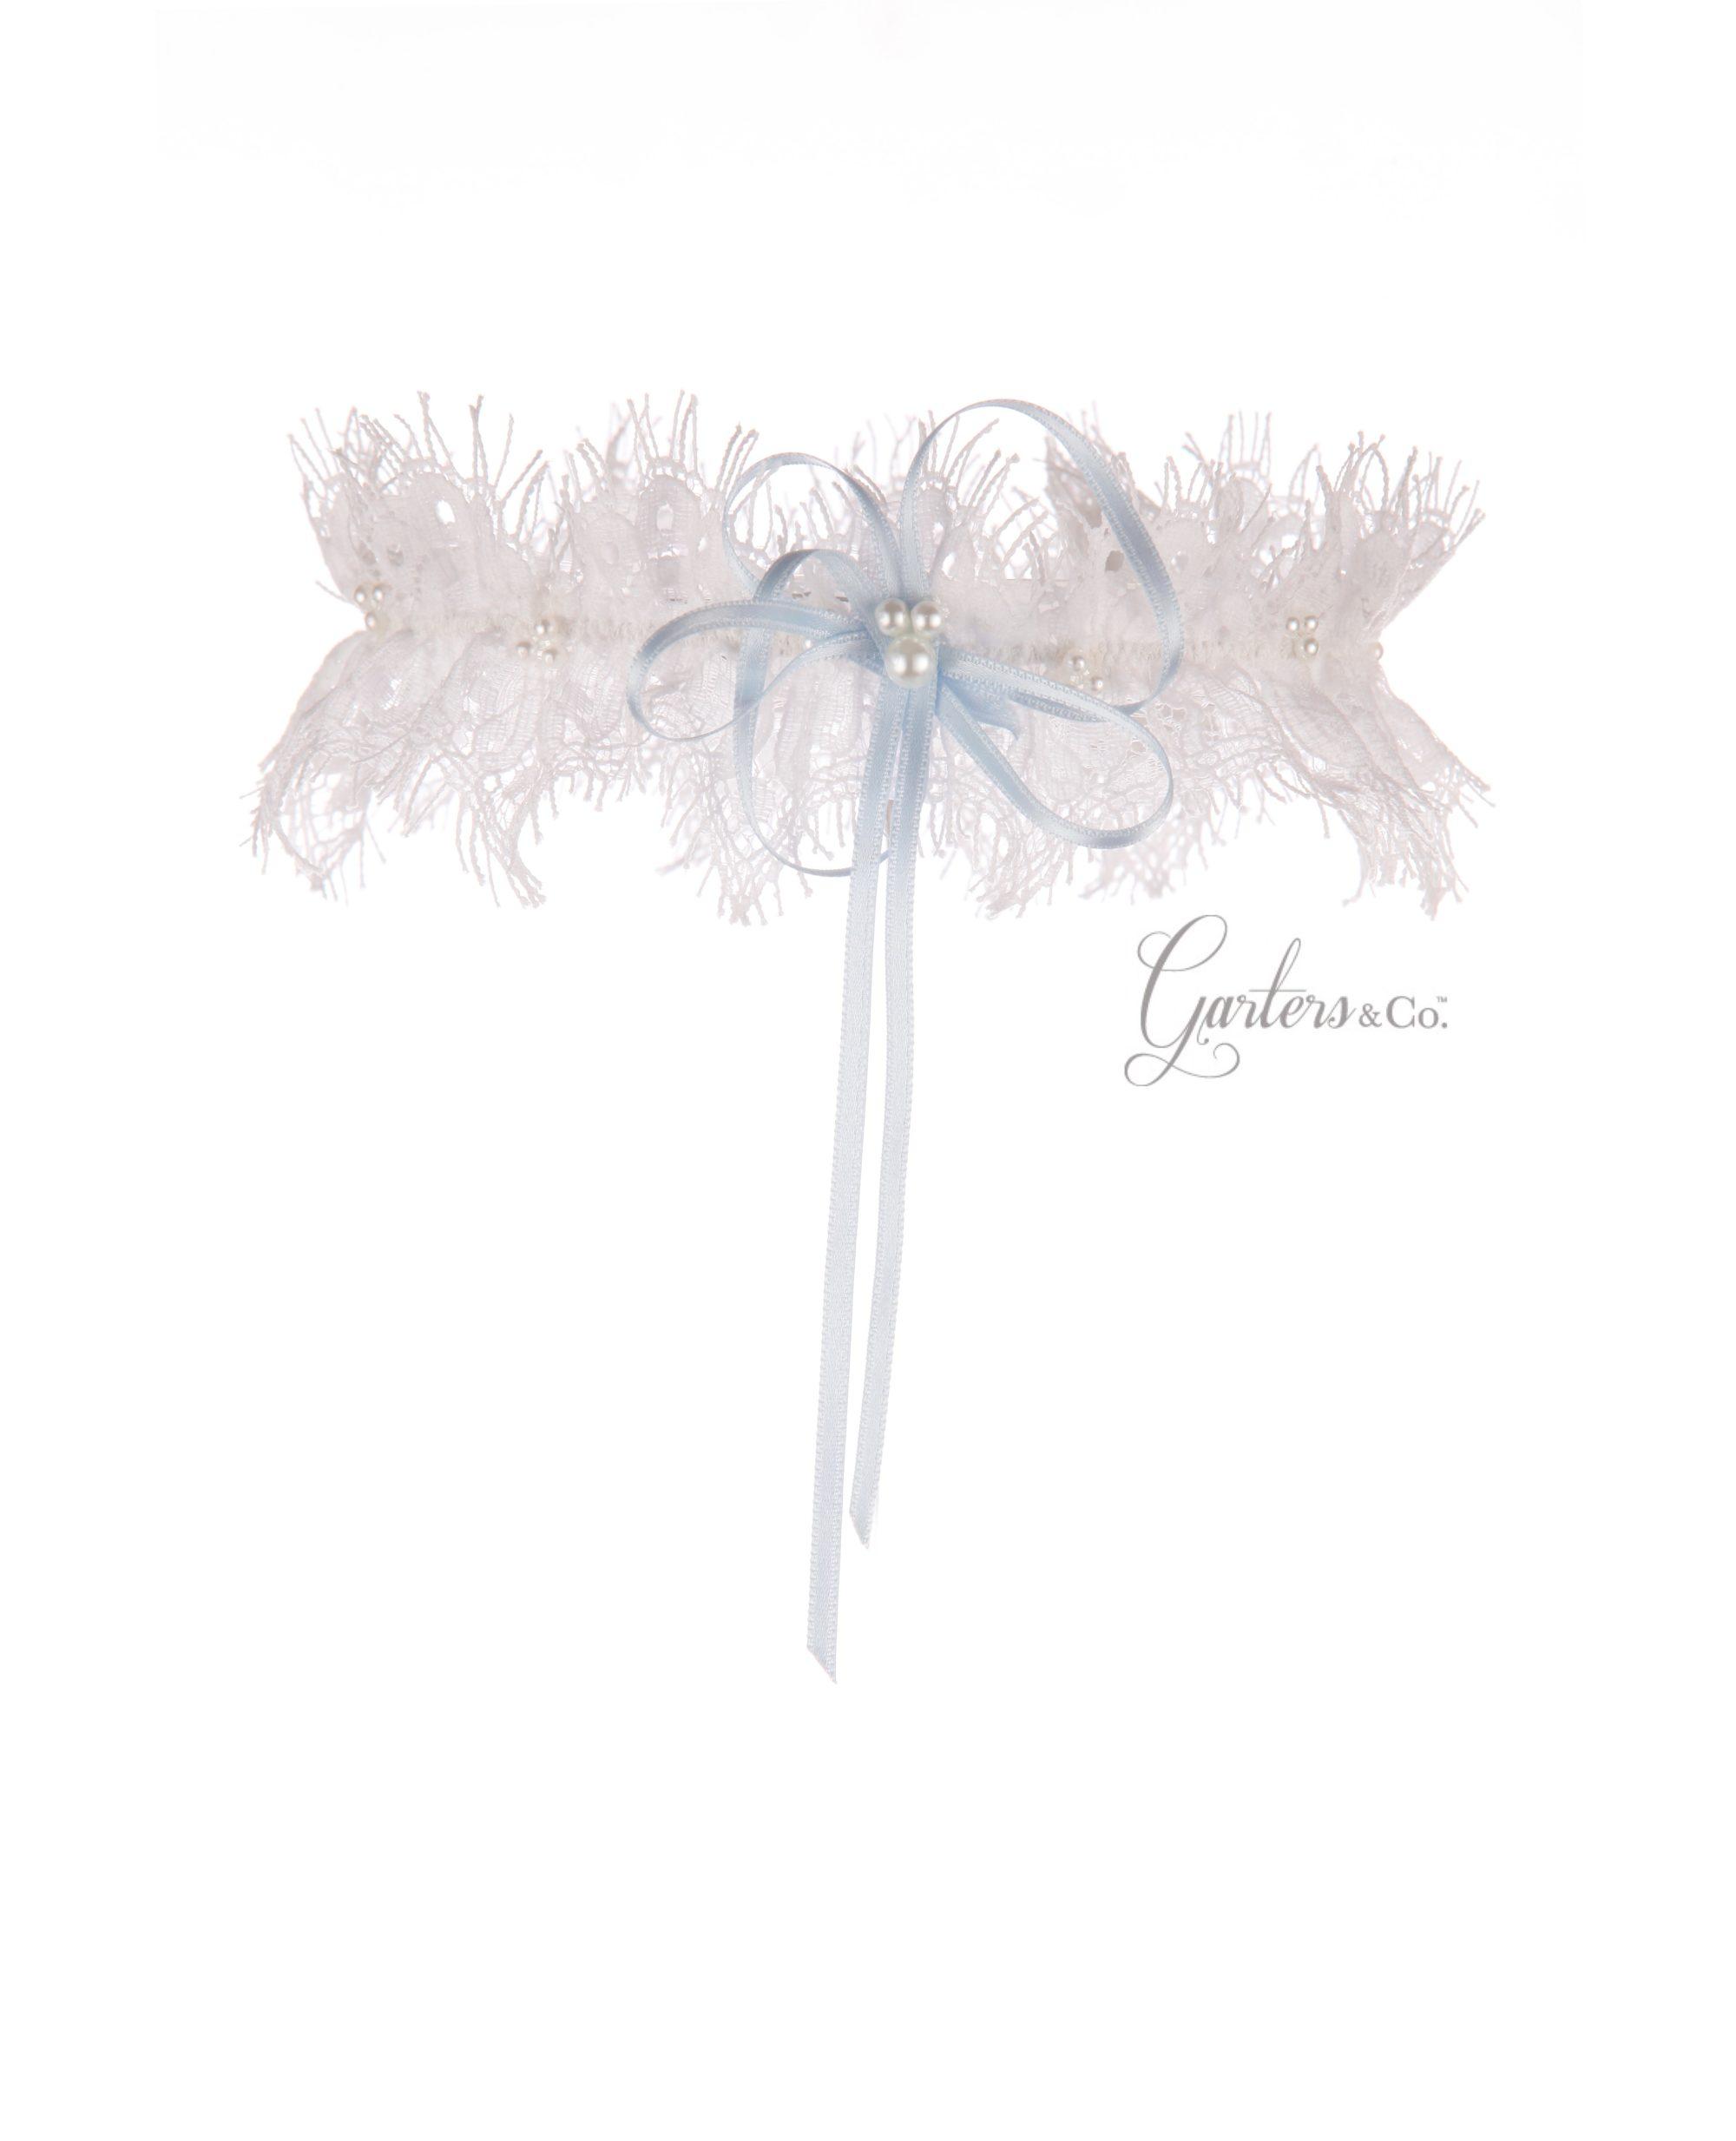 Jessica Silk White Wedding Garter with blue bow